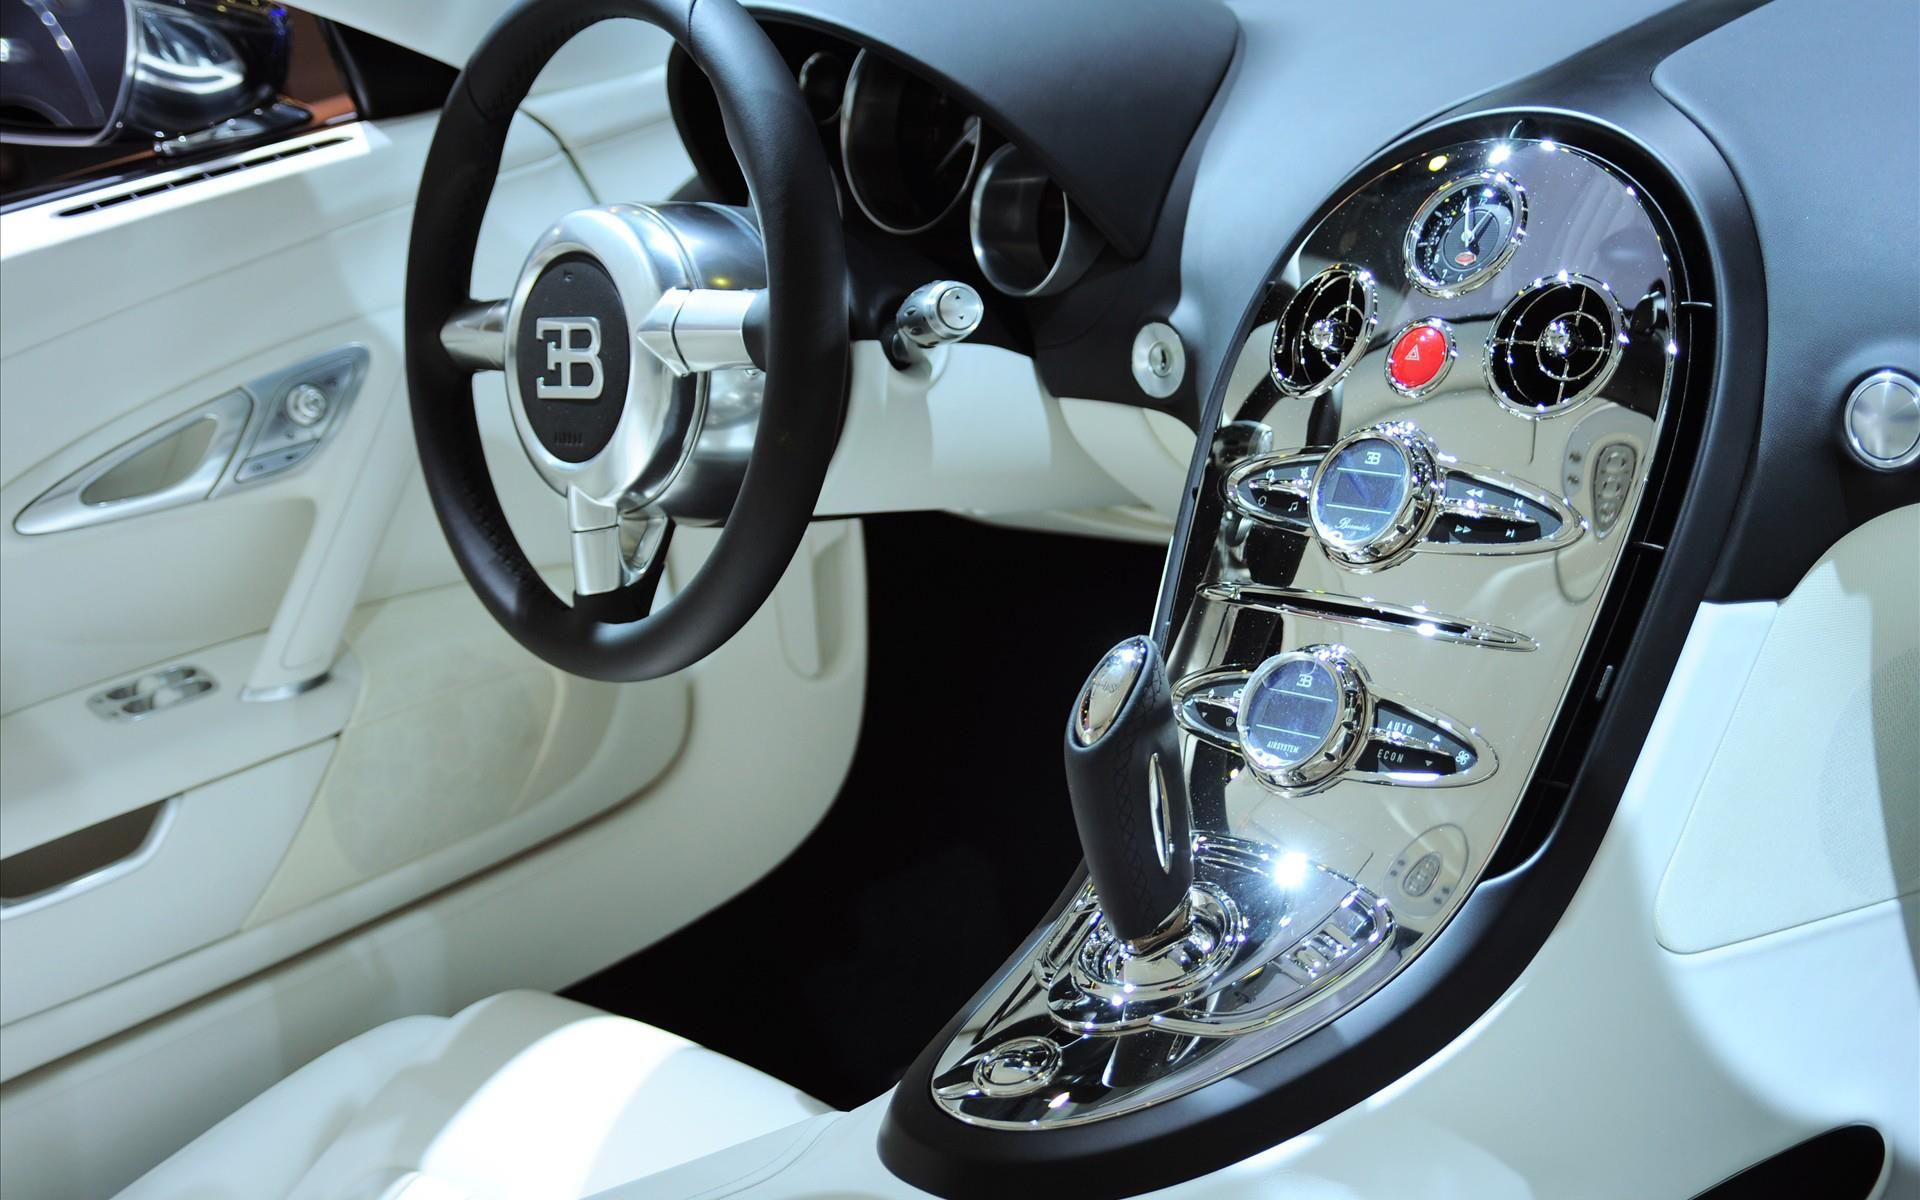 Bugatty Veyron Bugatti Veyron Bugatti Veyron Interior Veyron